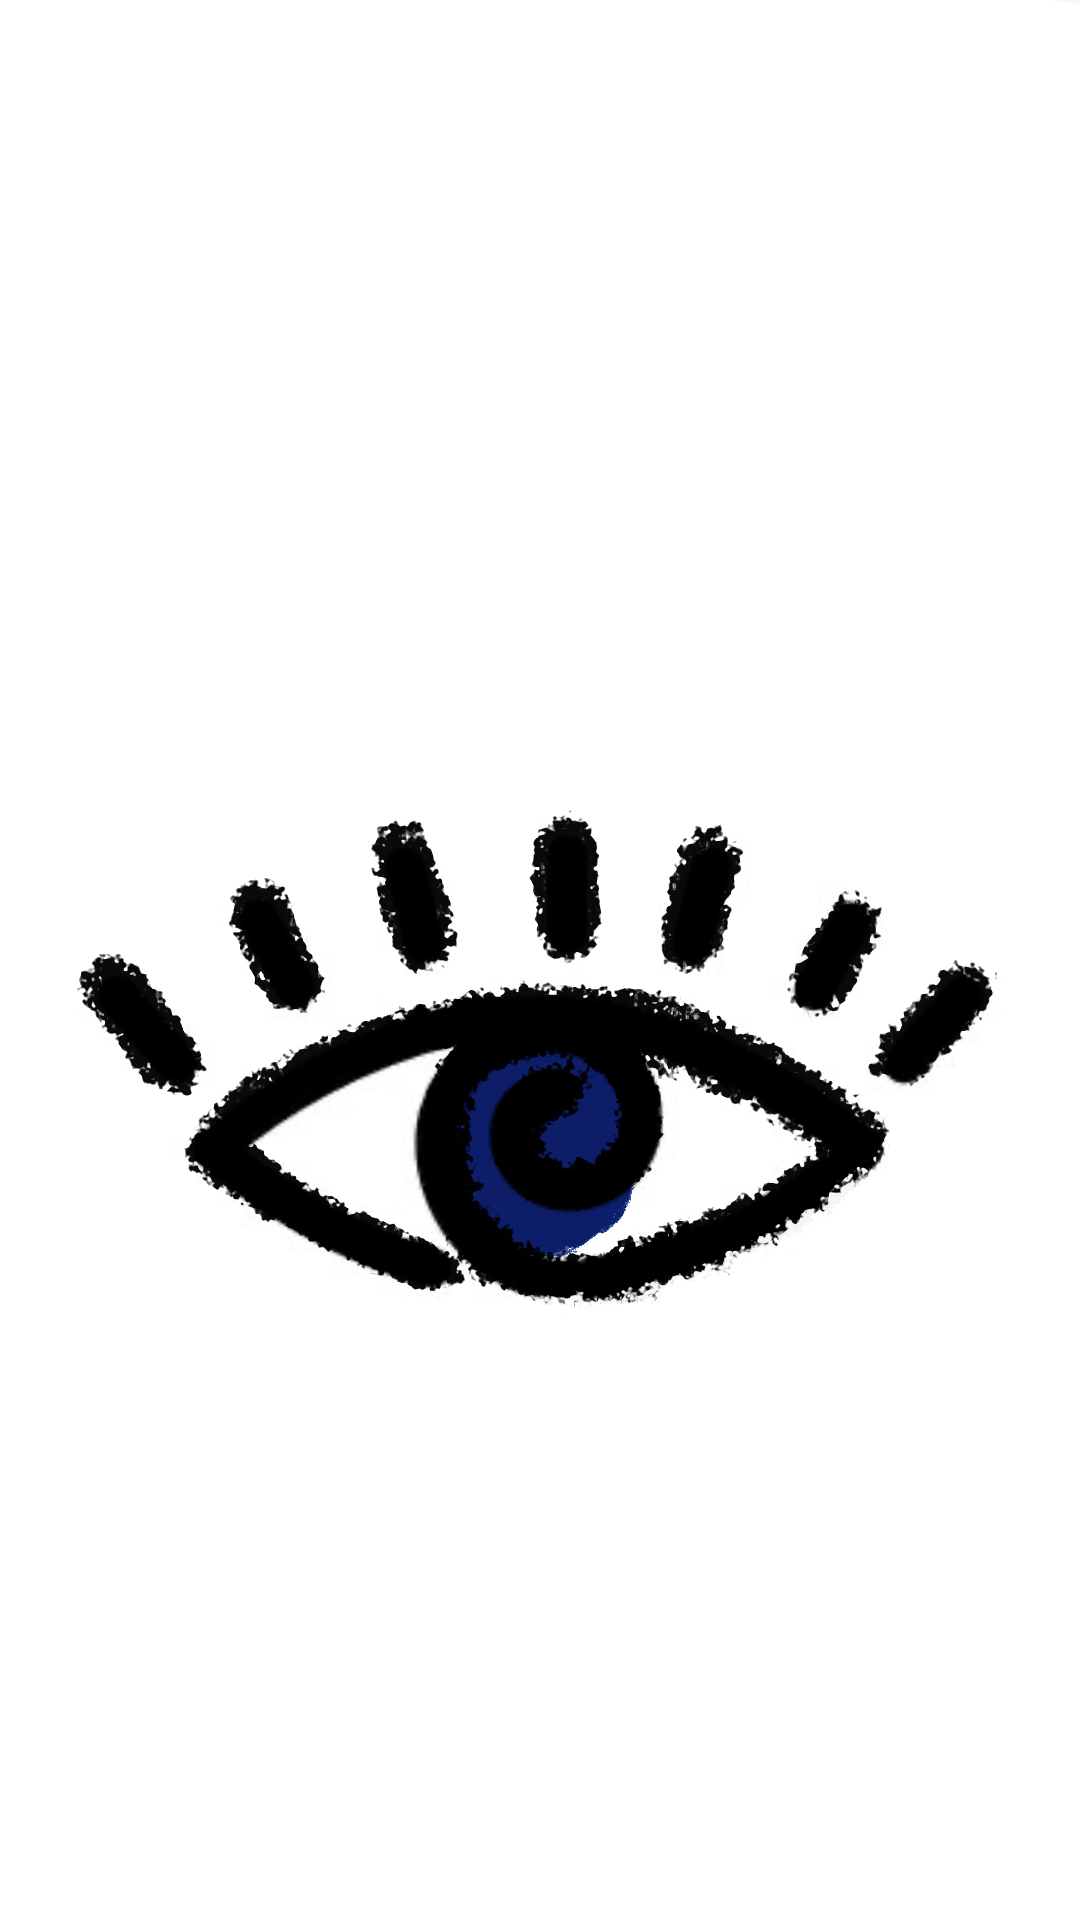 Evil Eyes In 2021 Evil Eye Tattoo Eye Drawing Simple Eye Tattoo